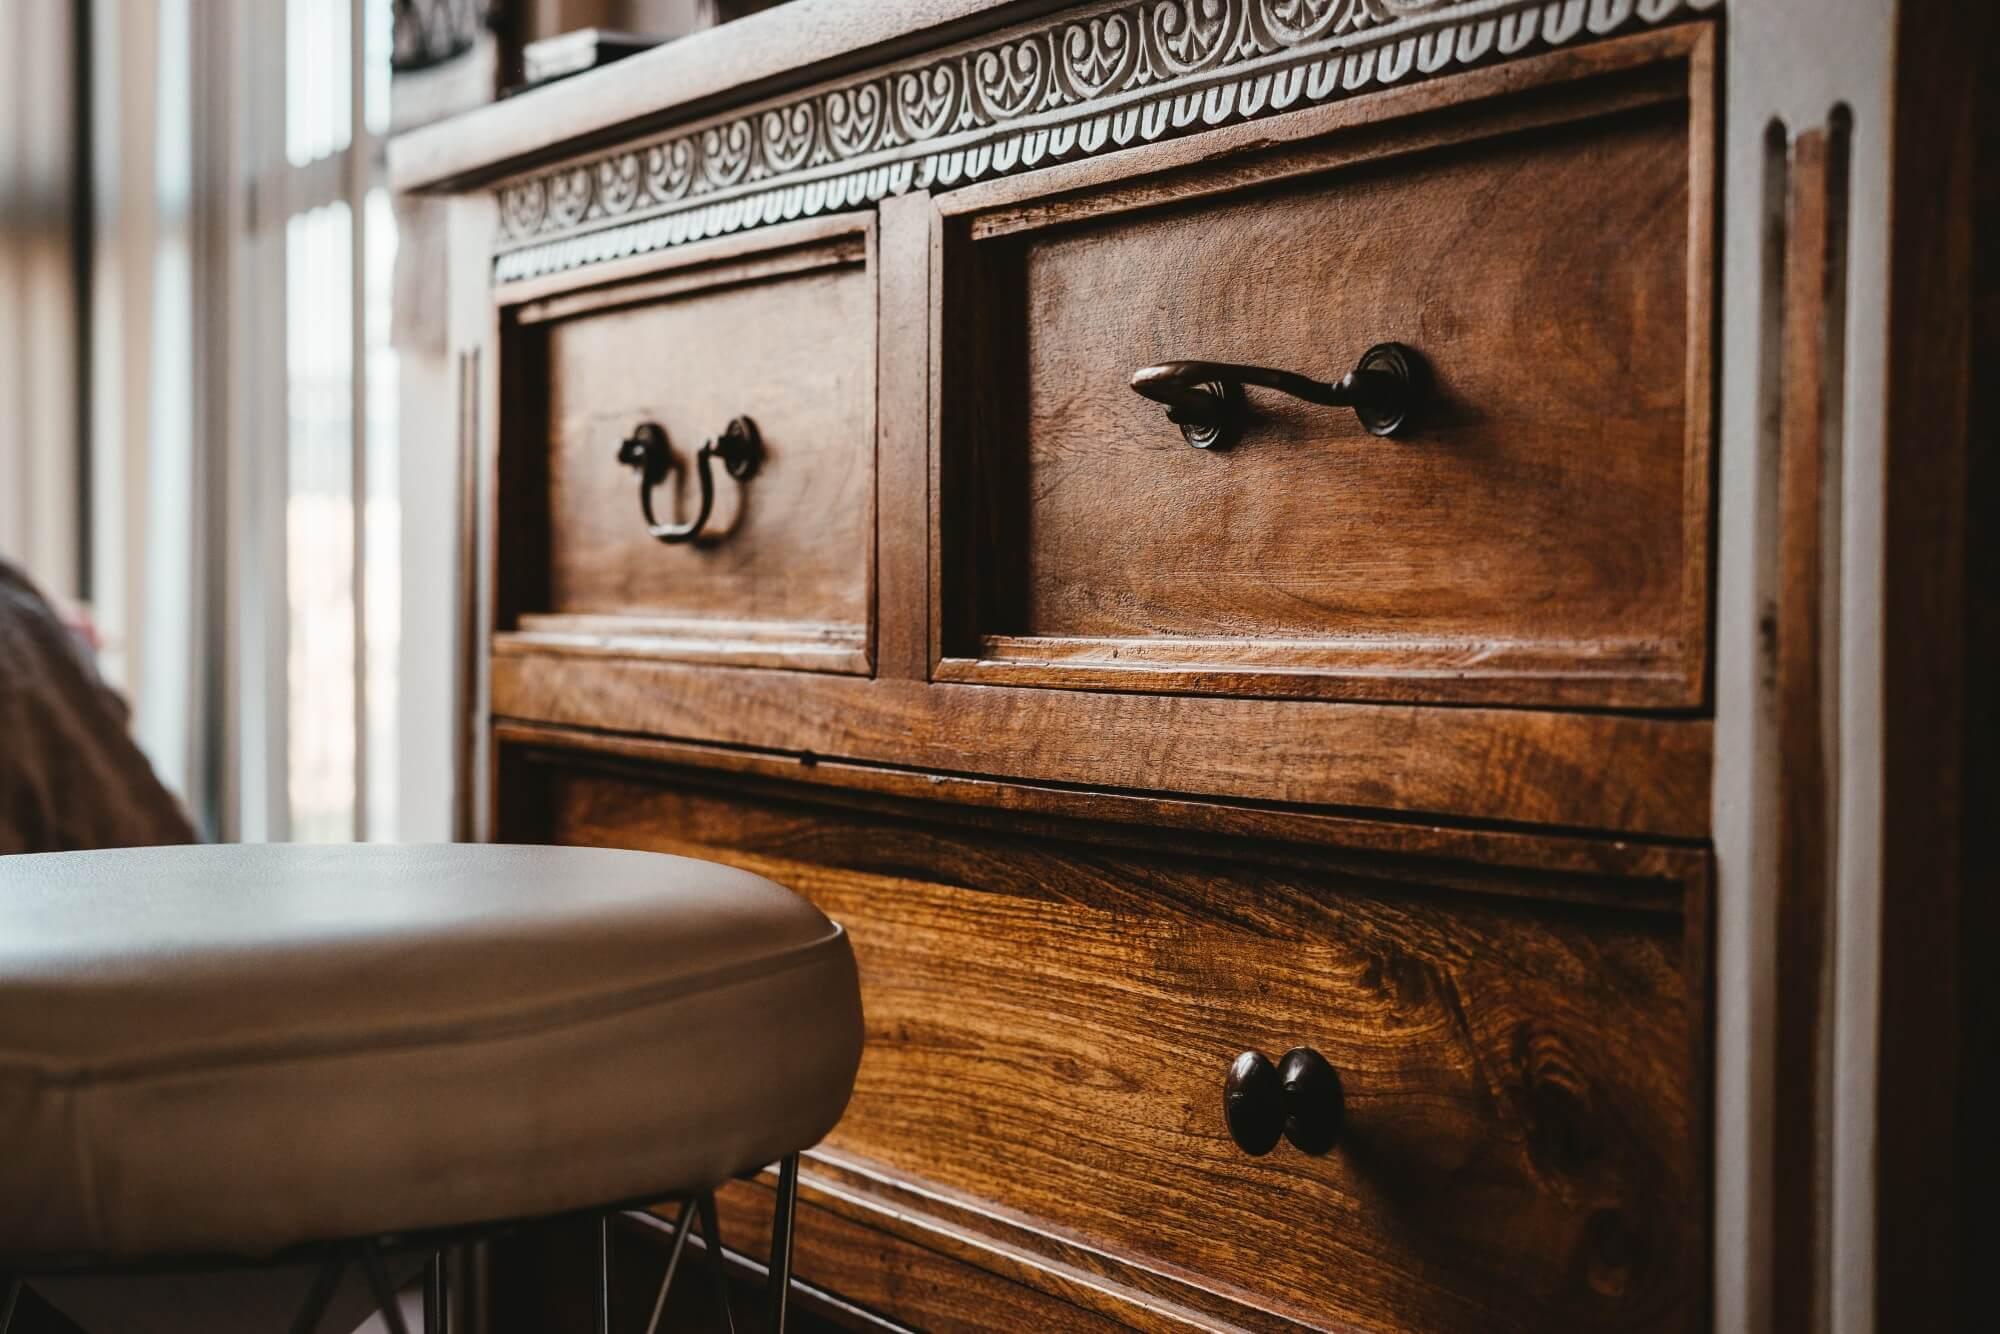 Wooden dresser drawers